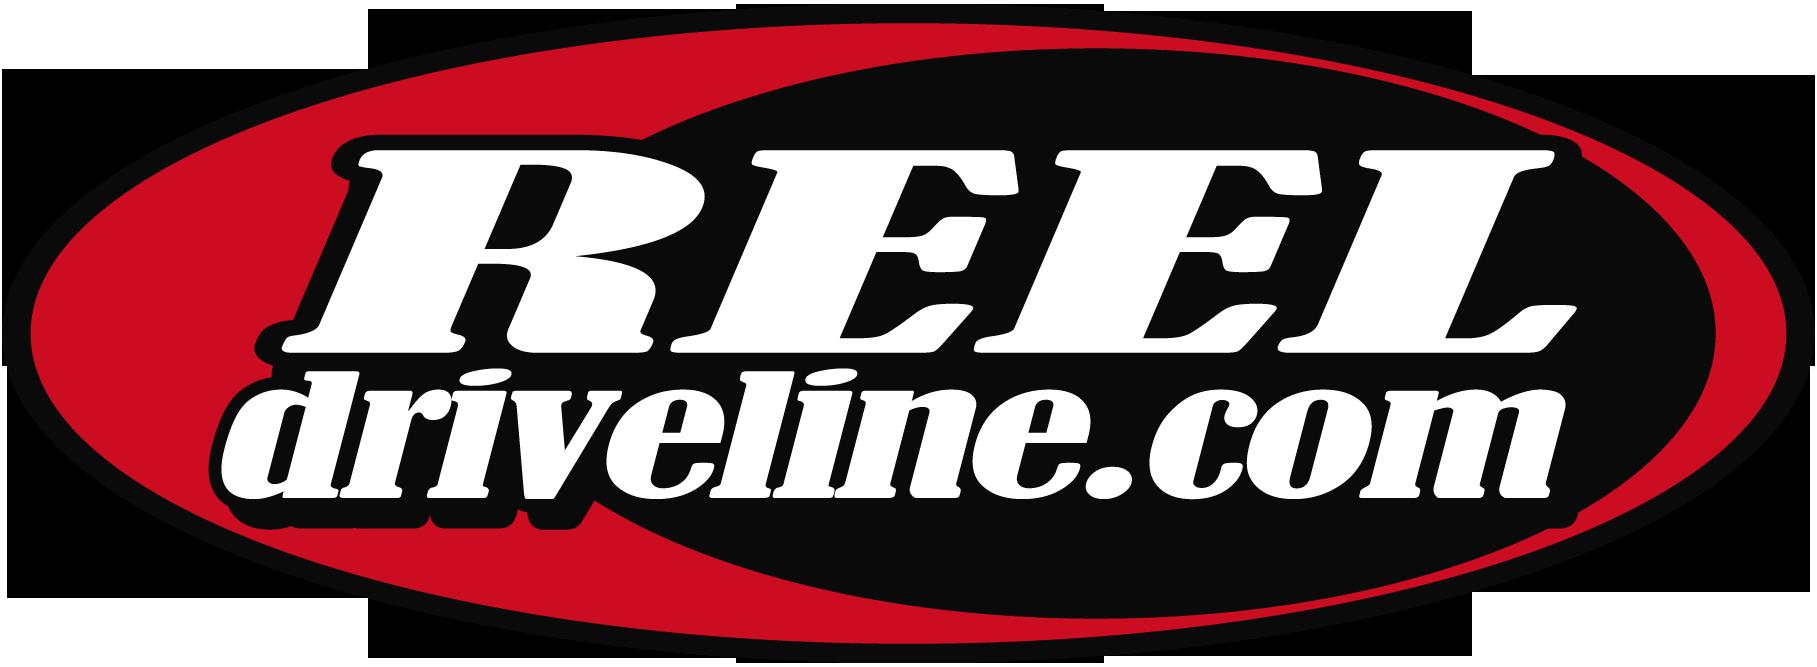 je-reel-logo.png